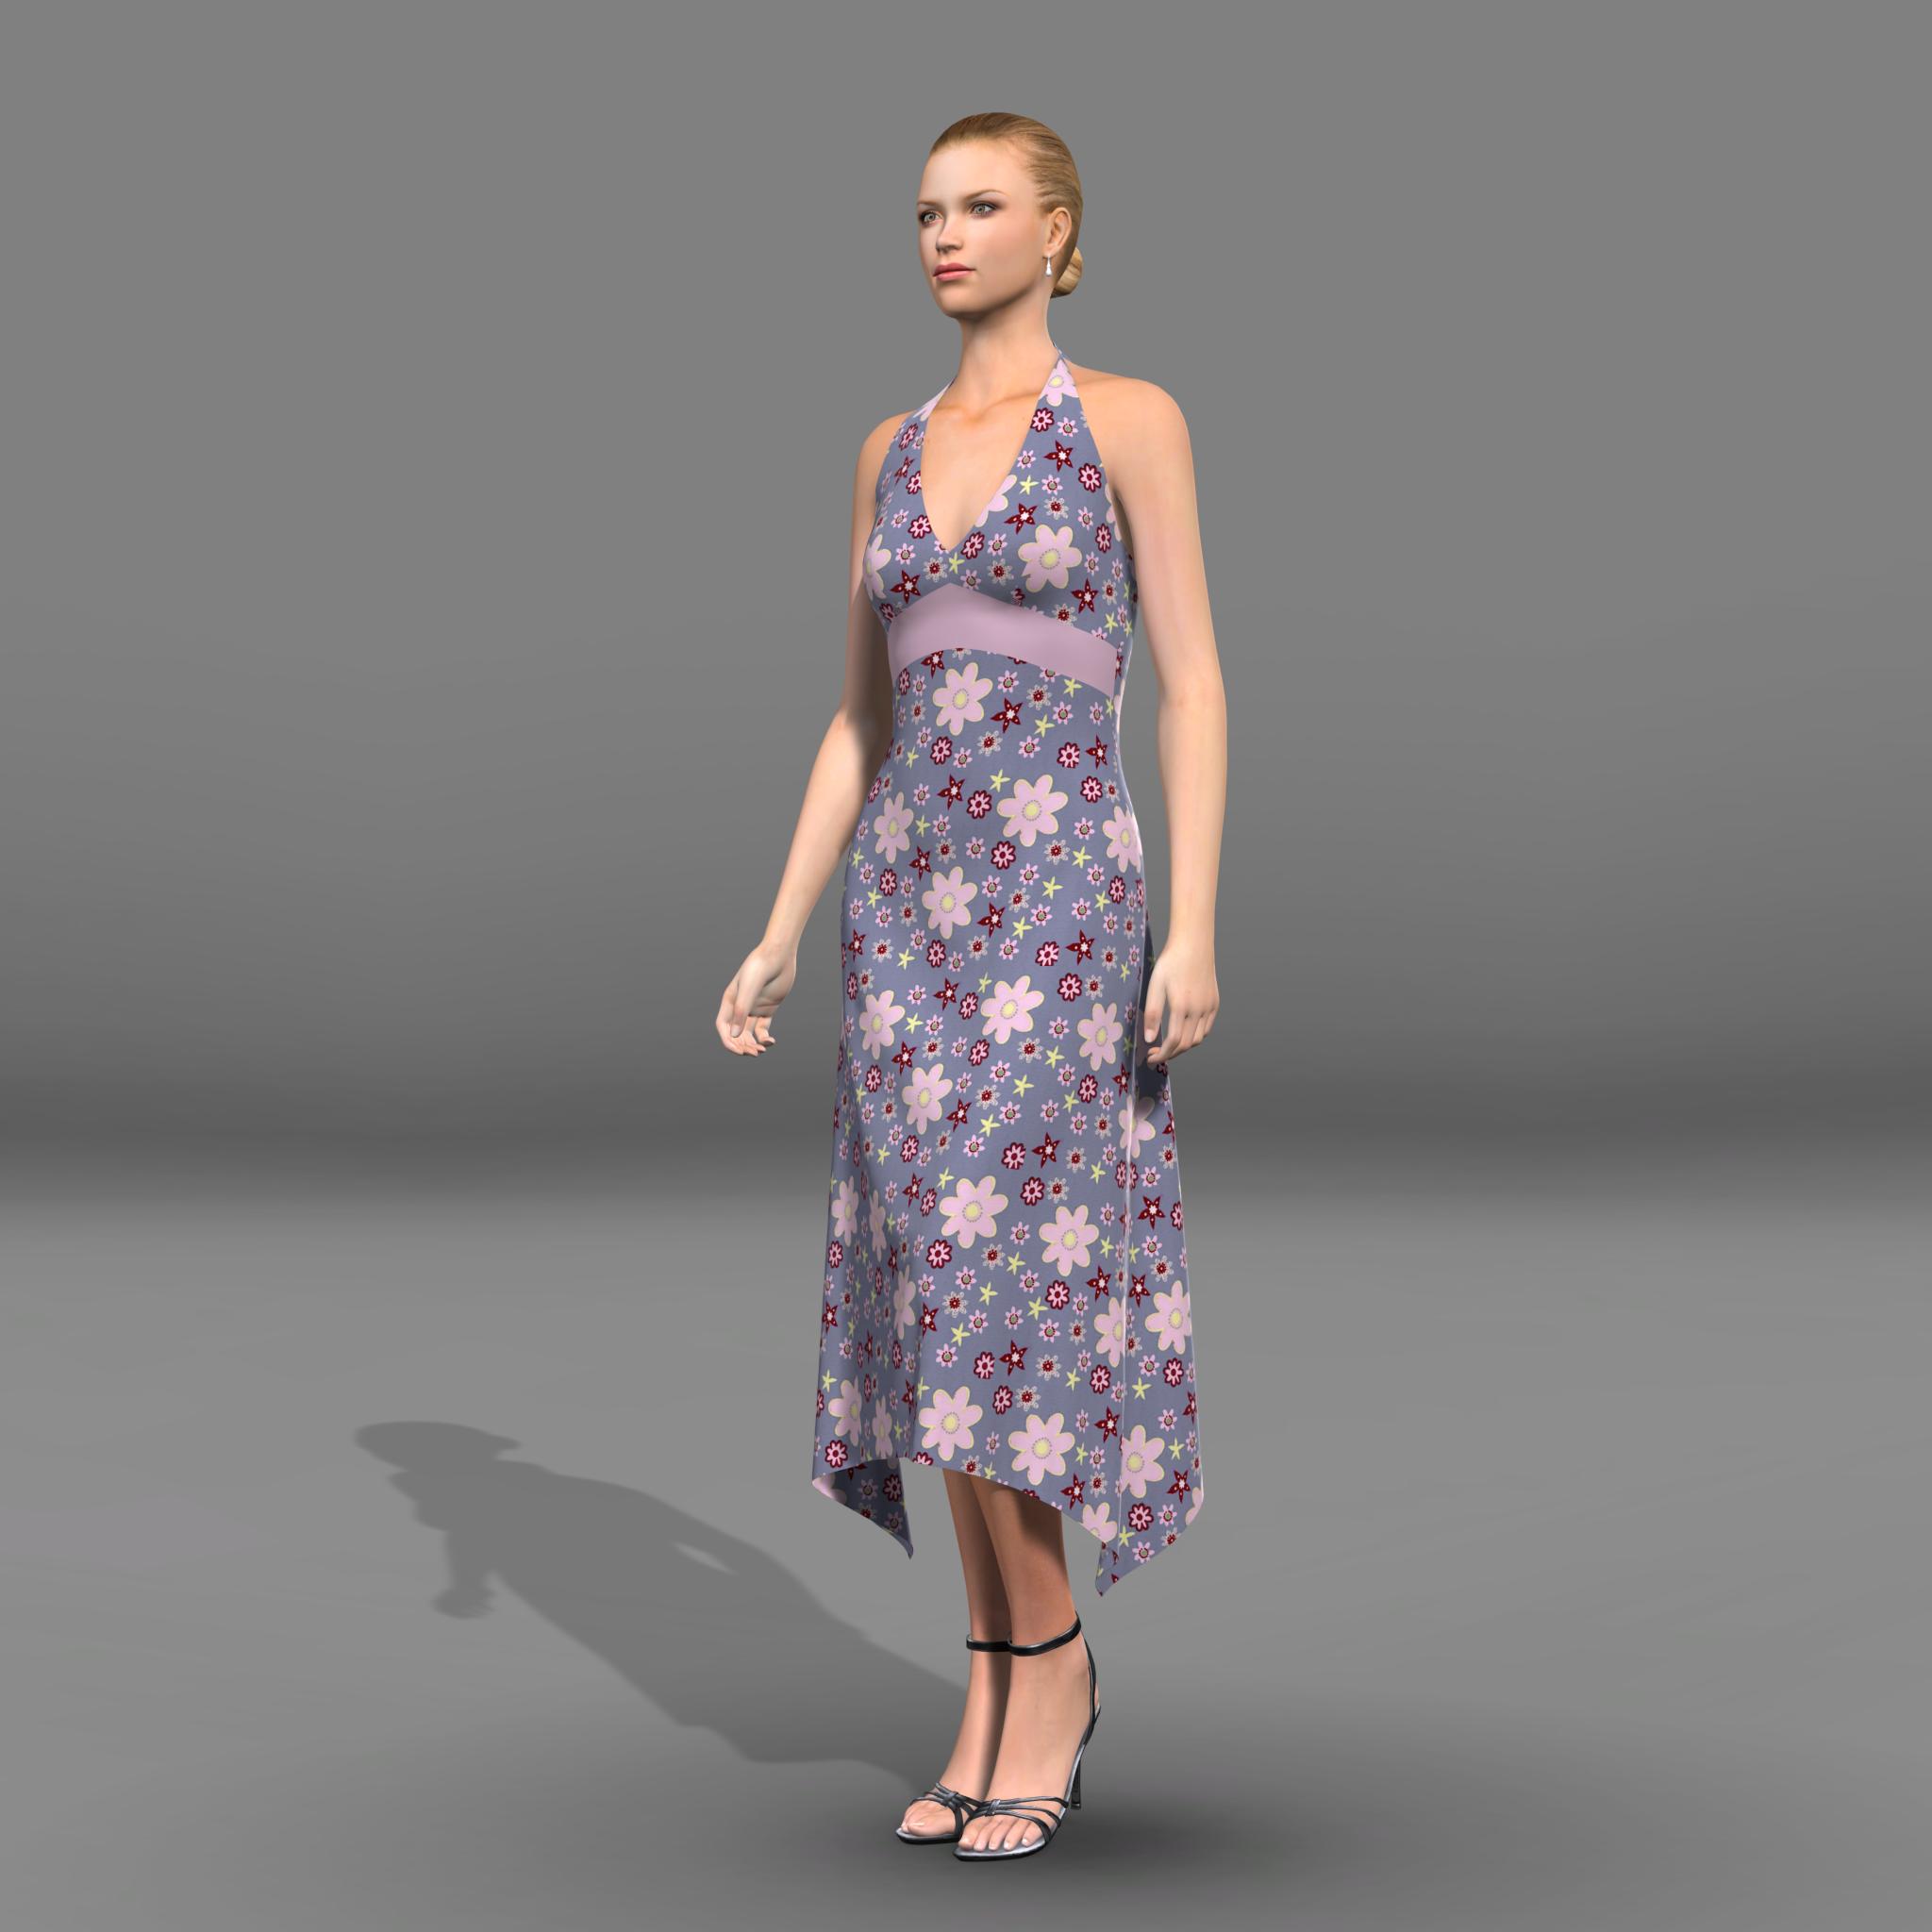 Optitex 3D Garment Simulation